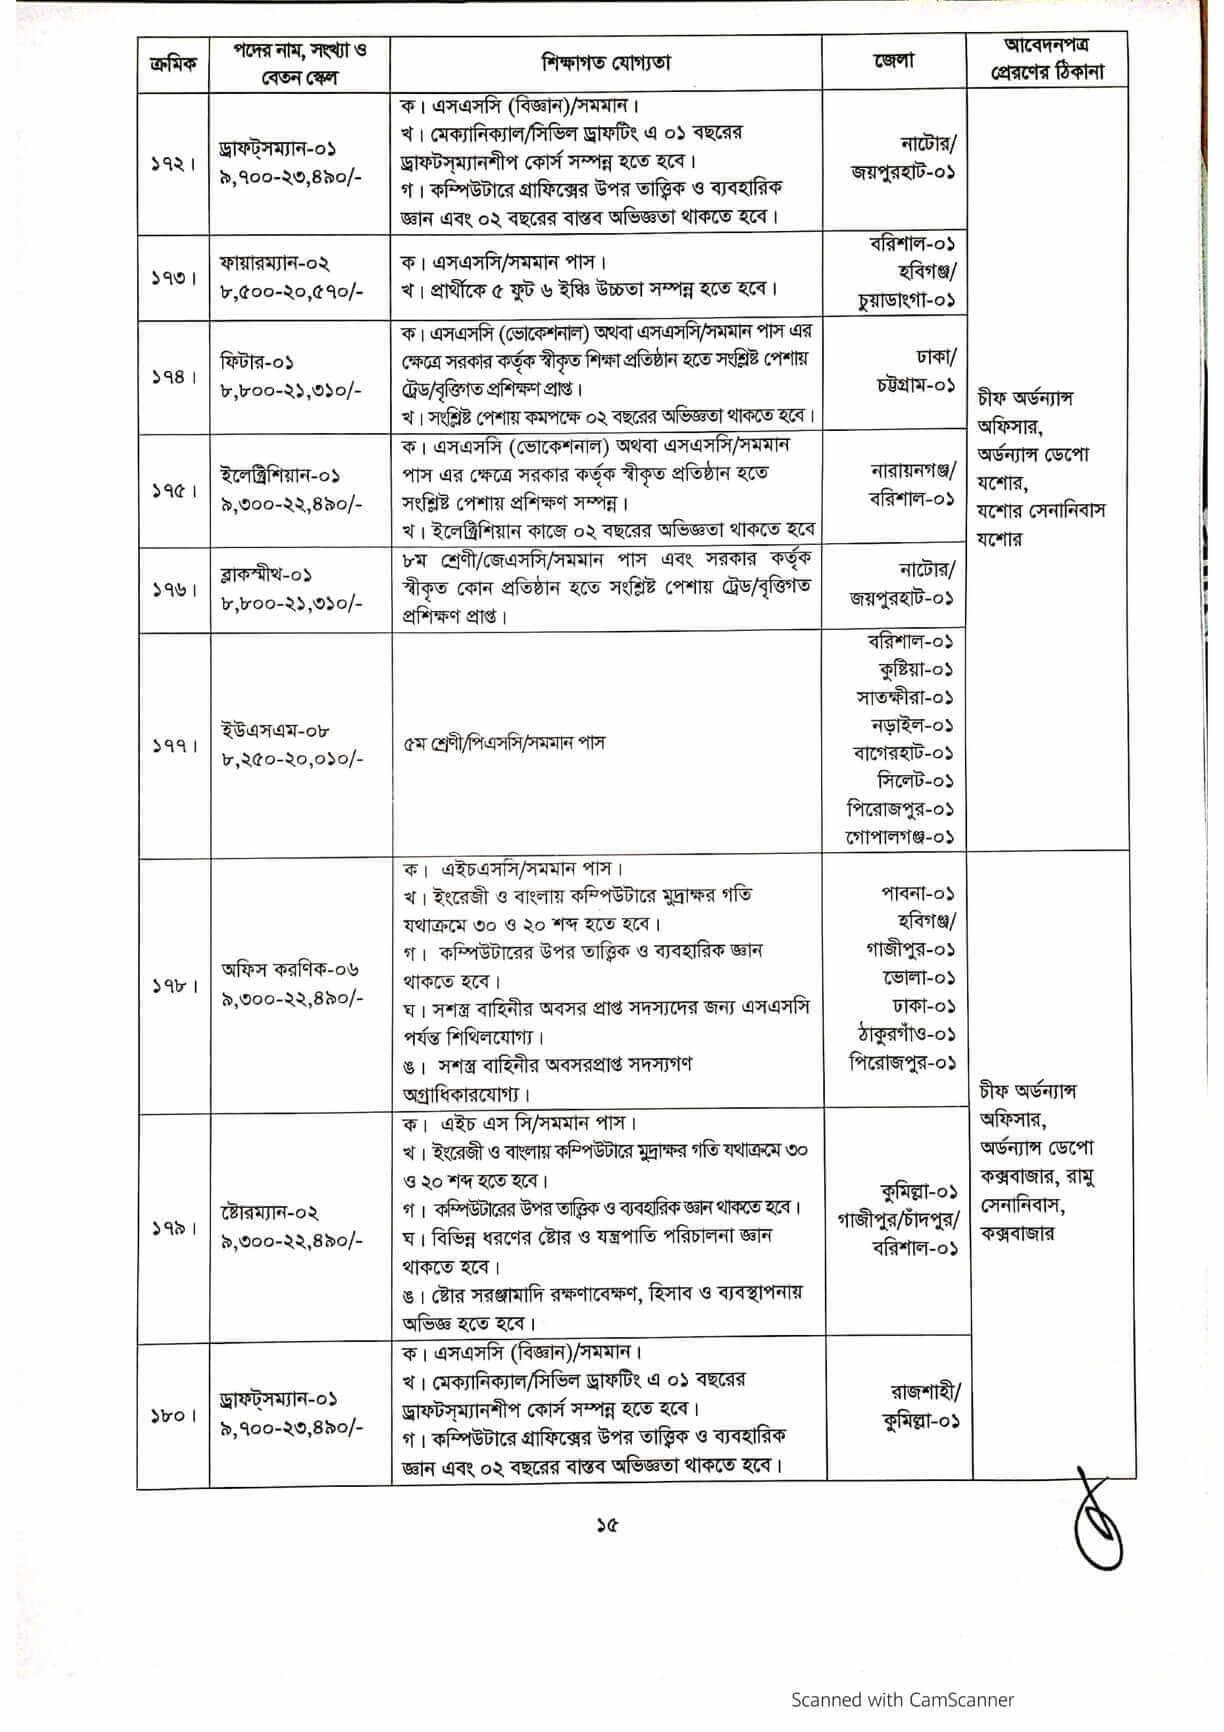 Army civilian job circular 2021